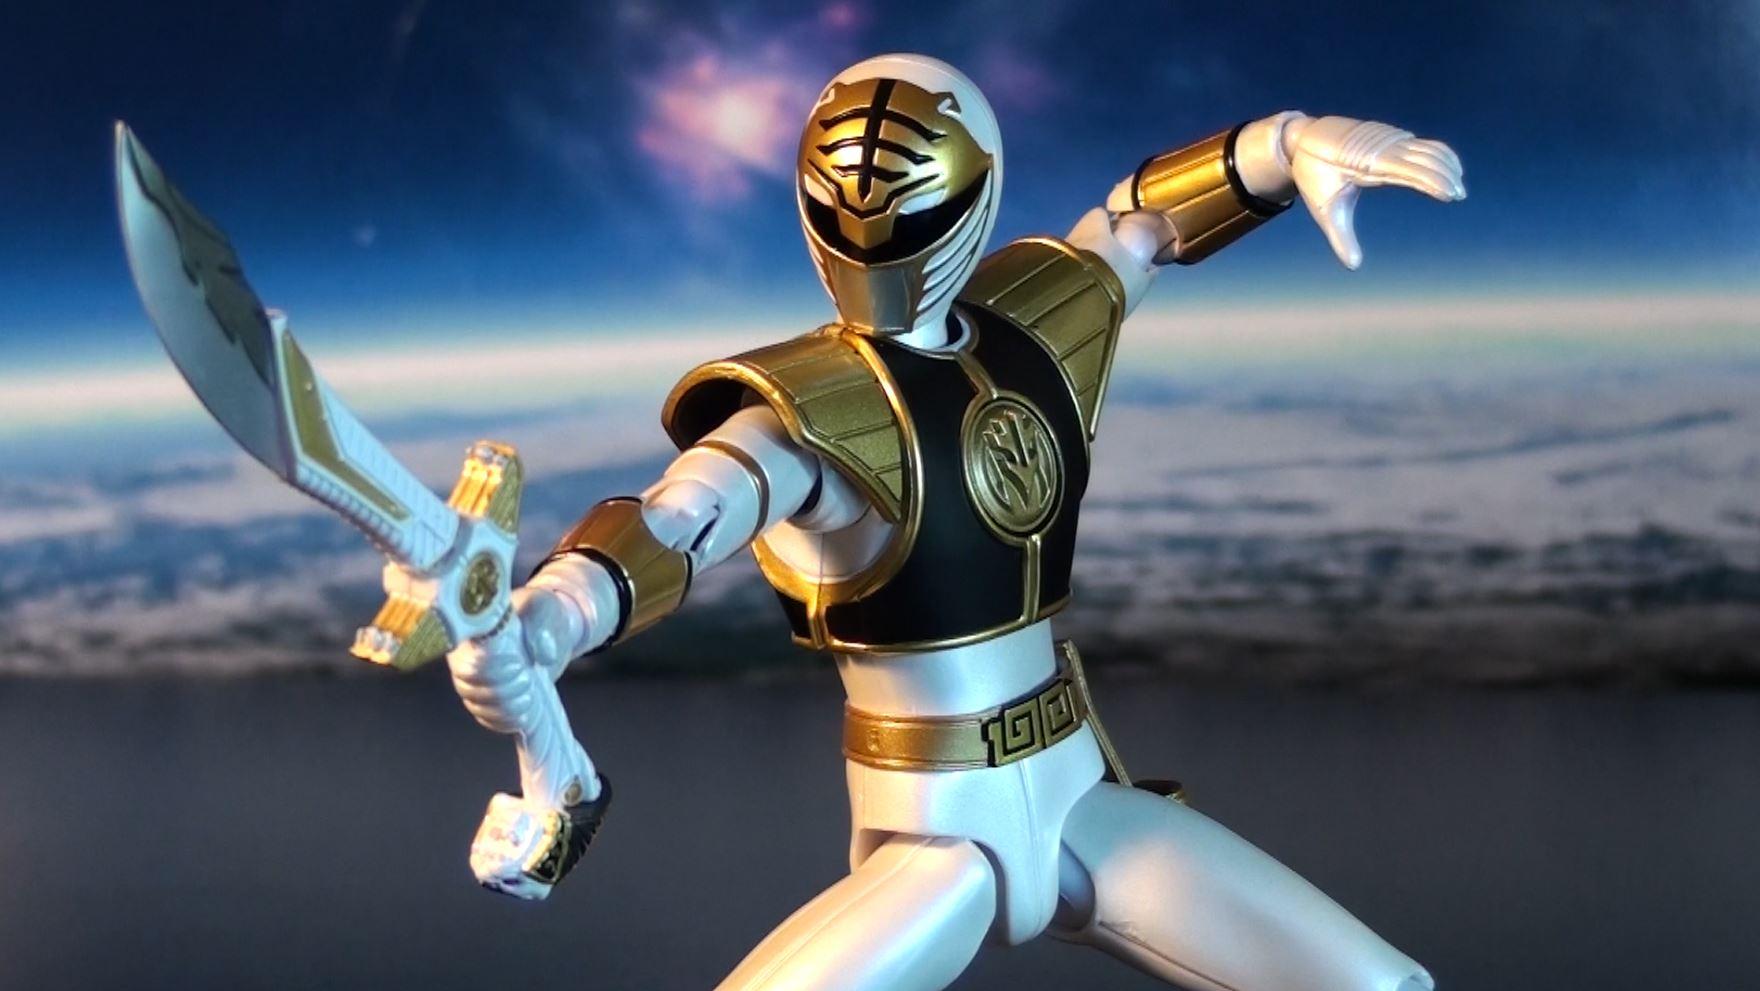 R292 Bandai S.H. Figuarts Mighty Morphin Power Rangers ...